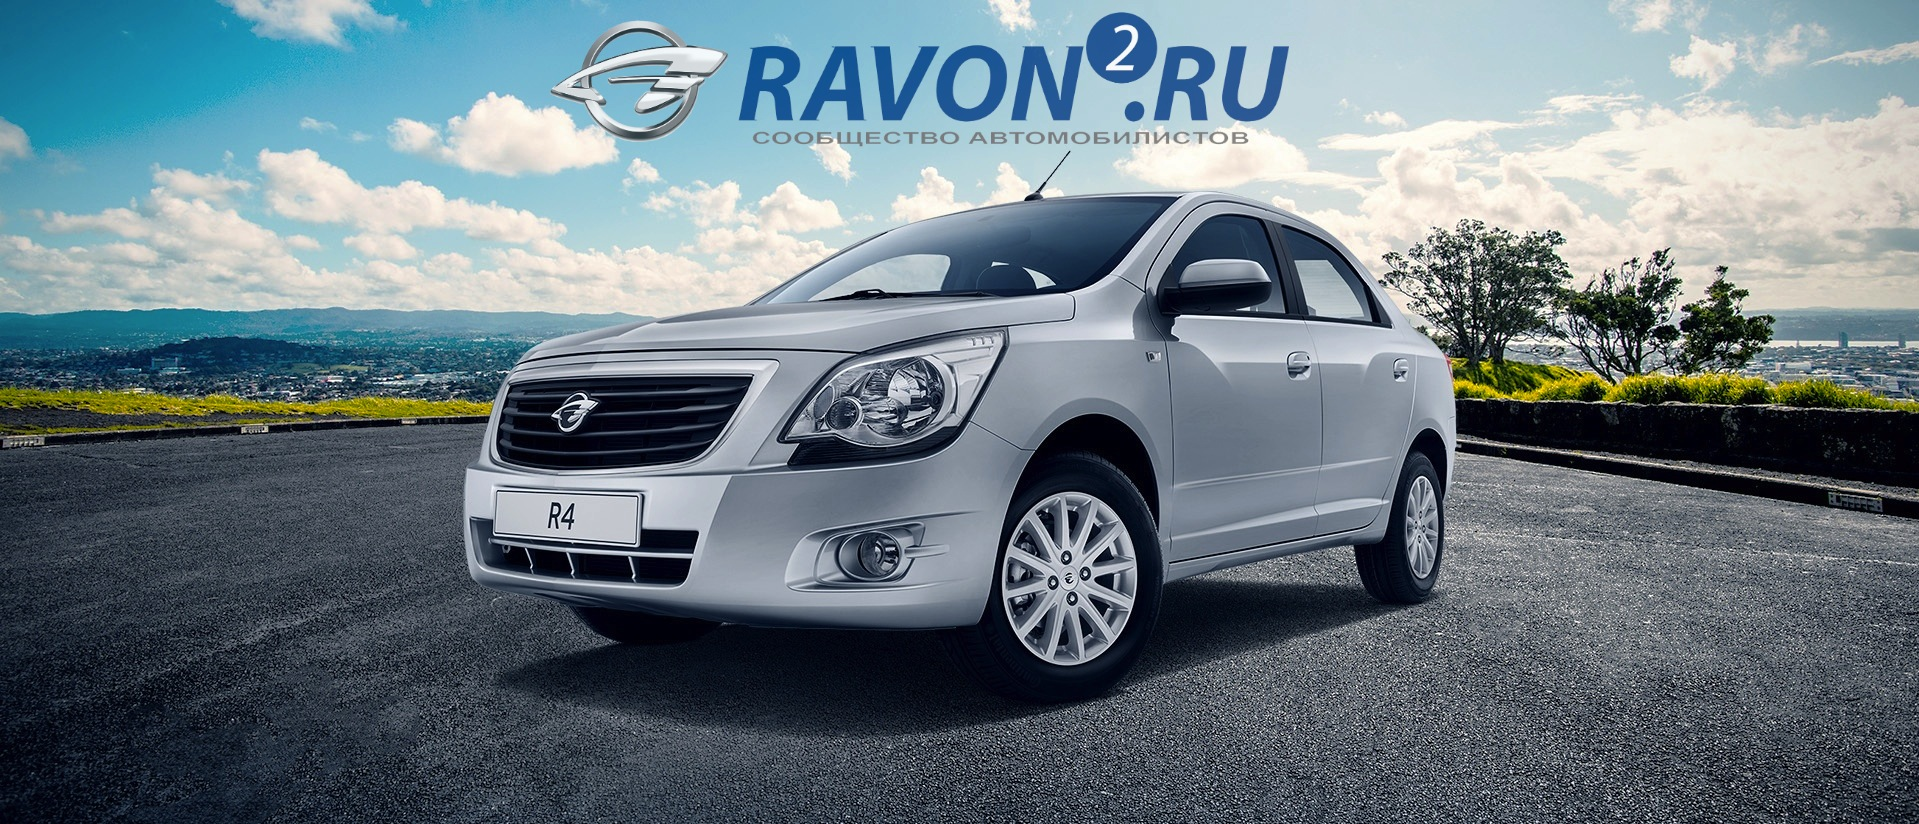 Ravon r2 2016 — отзыв владельца